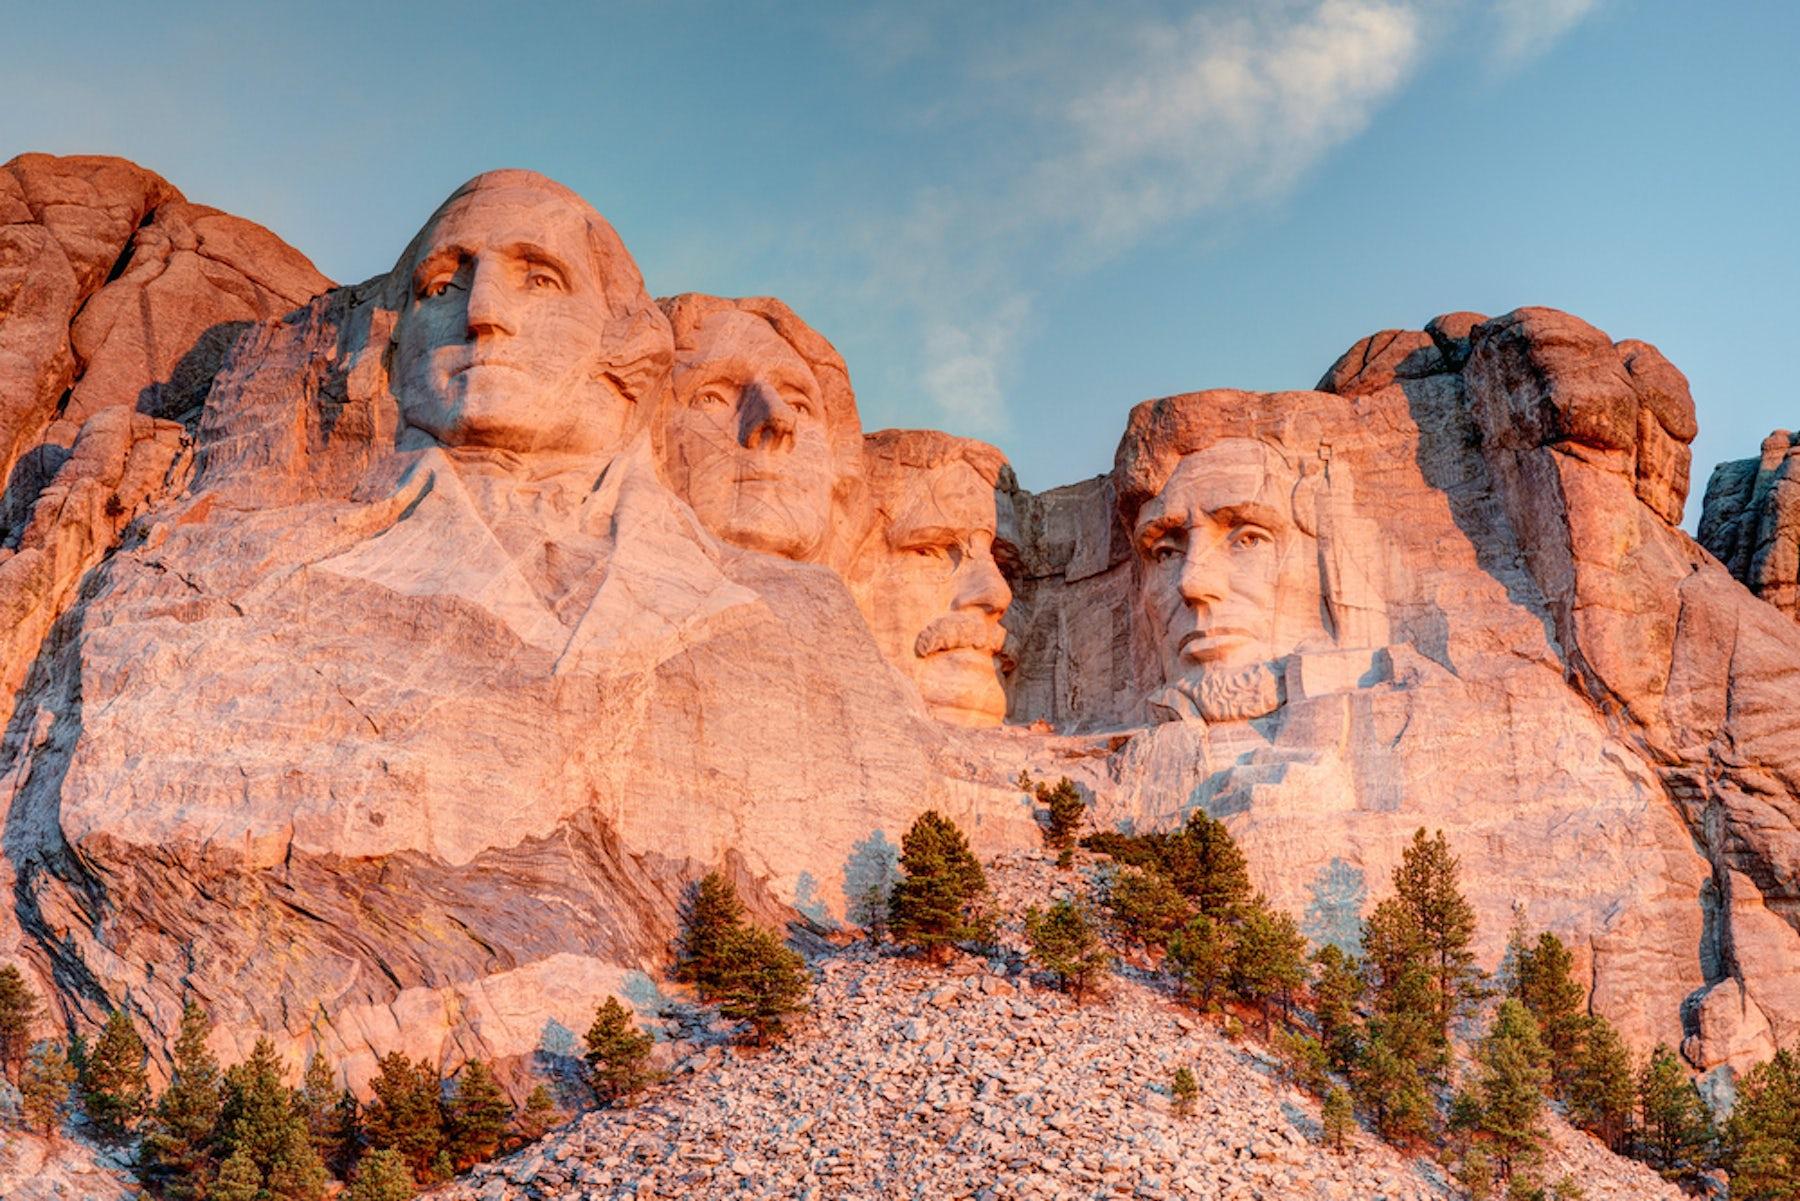 Mount Rushmore, South Dakota | Source: Shutterstock